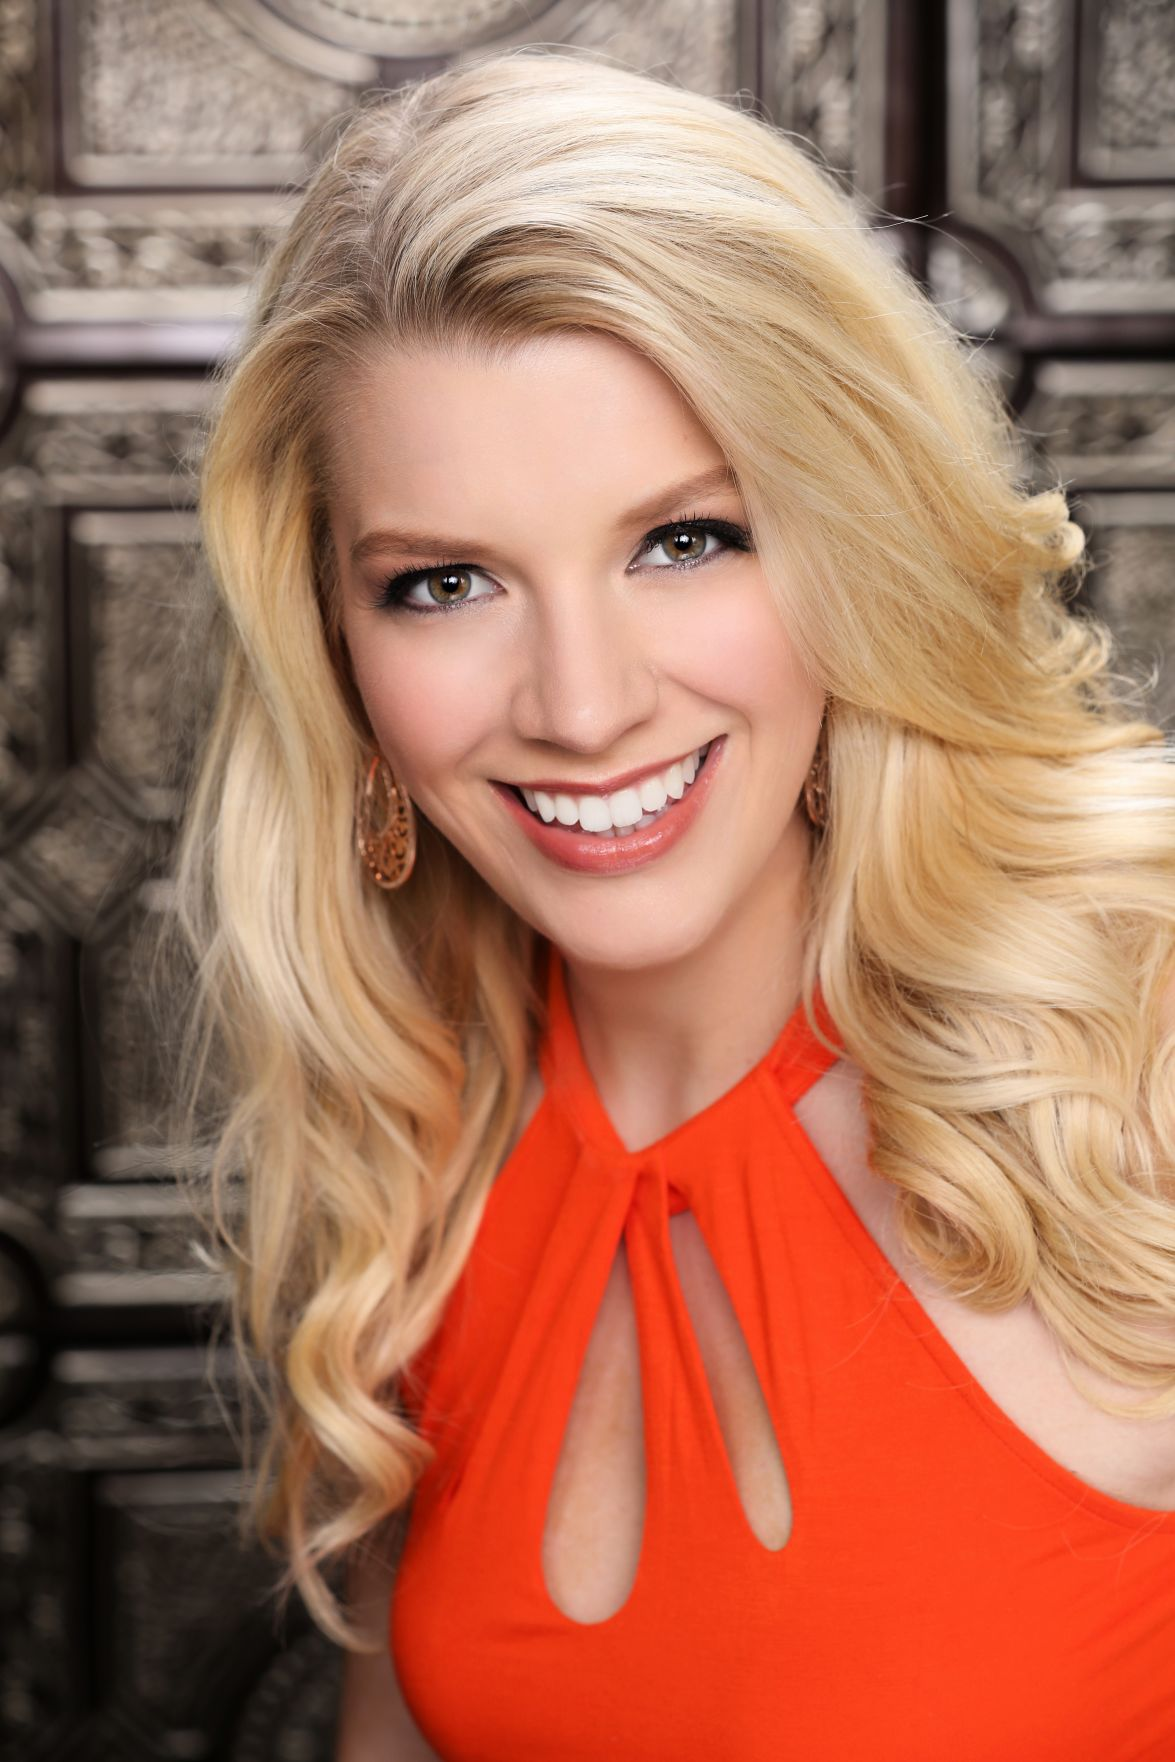 Miss California 2017 Jillian Smith